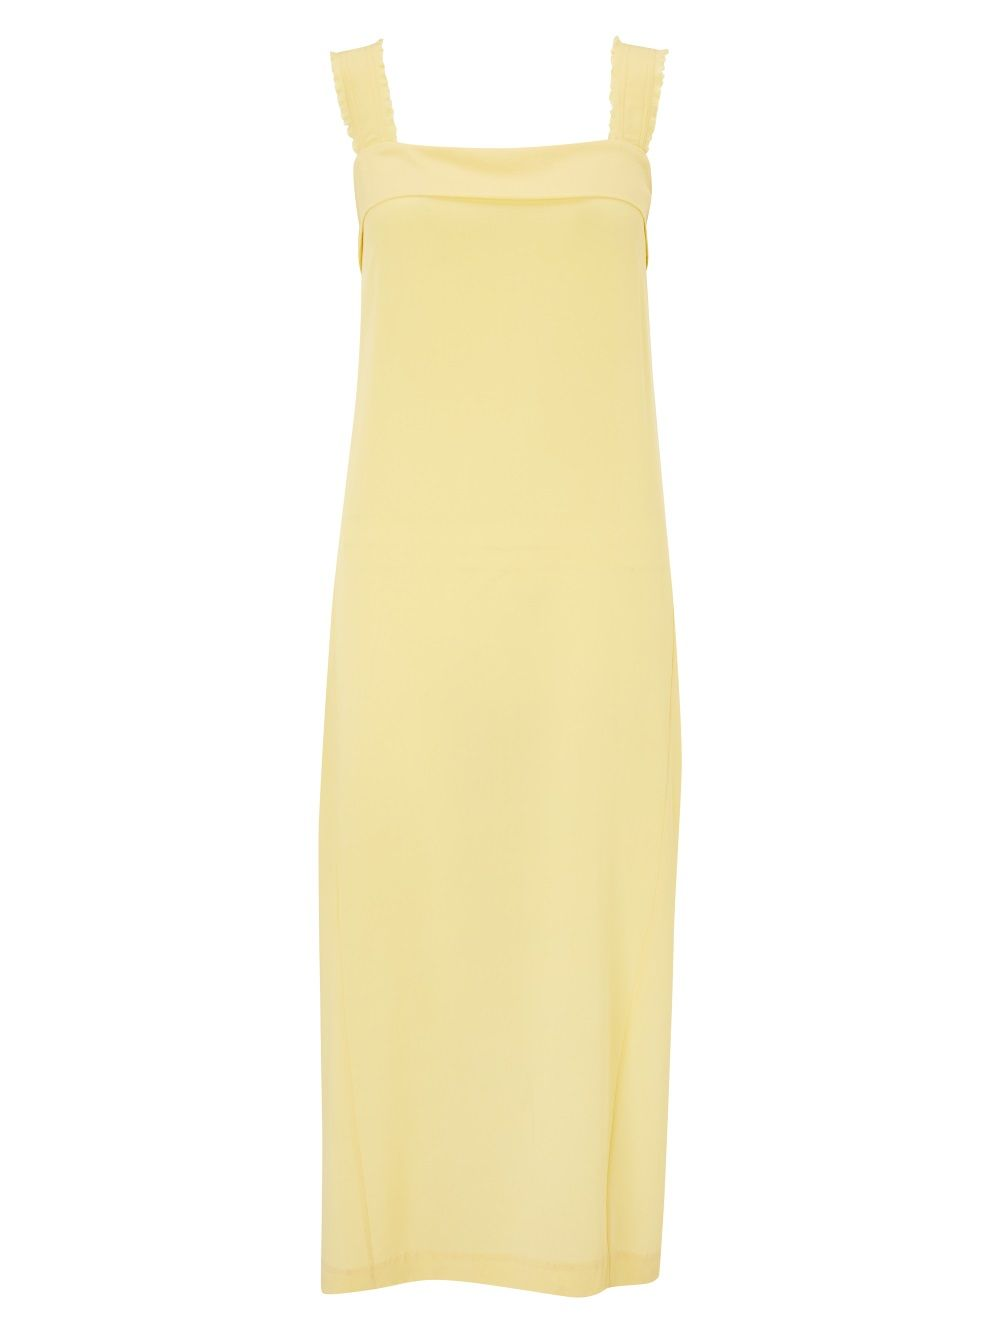 John Lewis paleyellow maxi dress